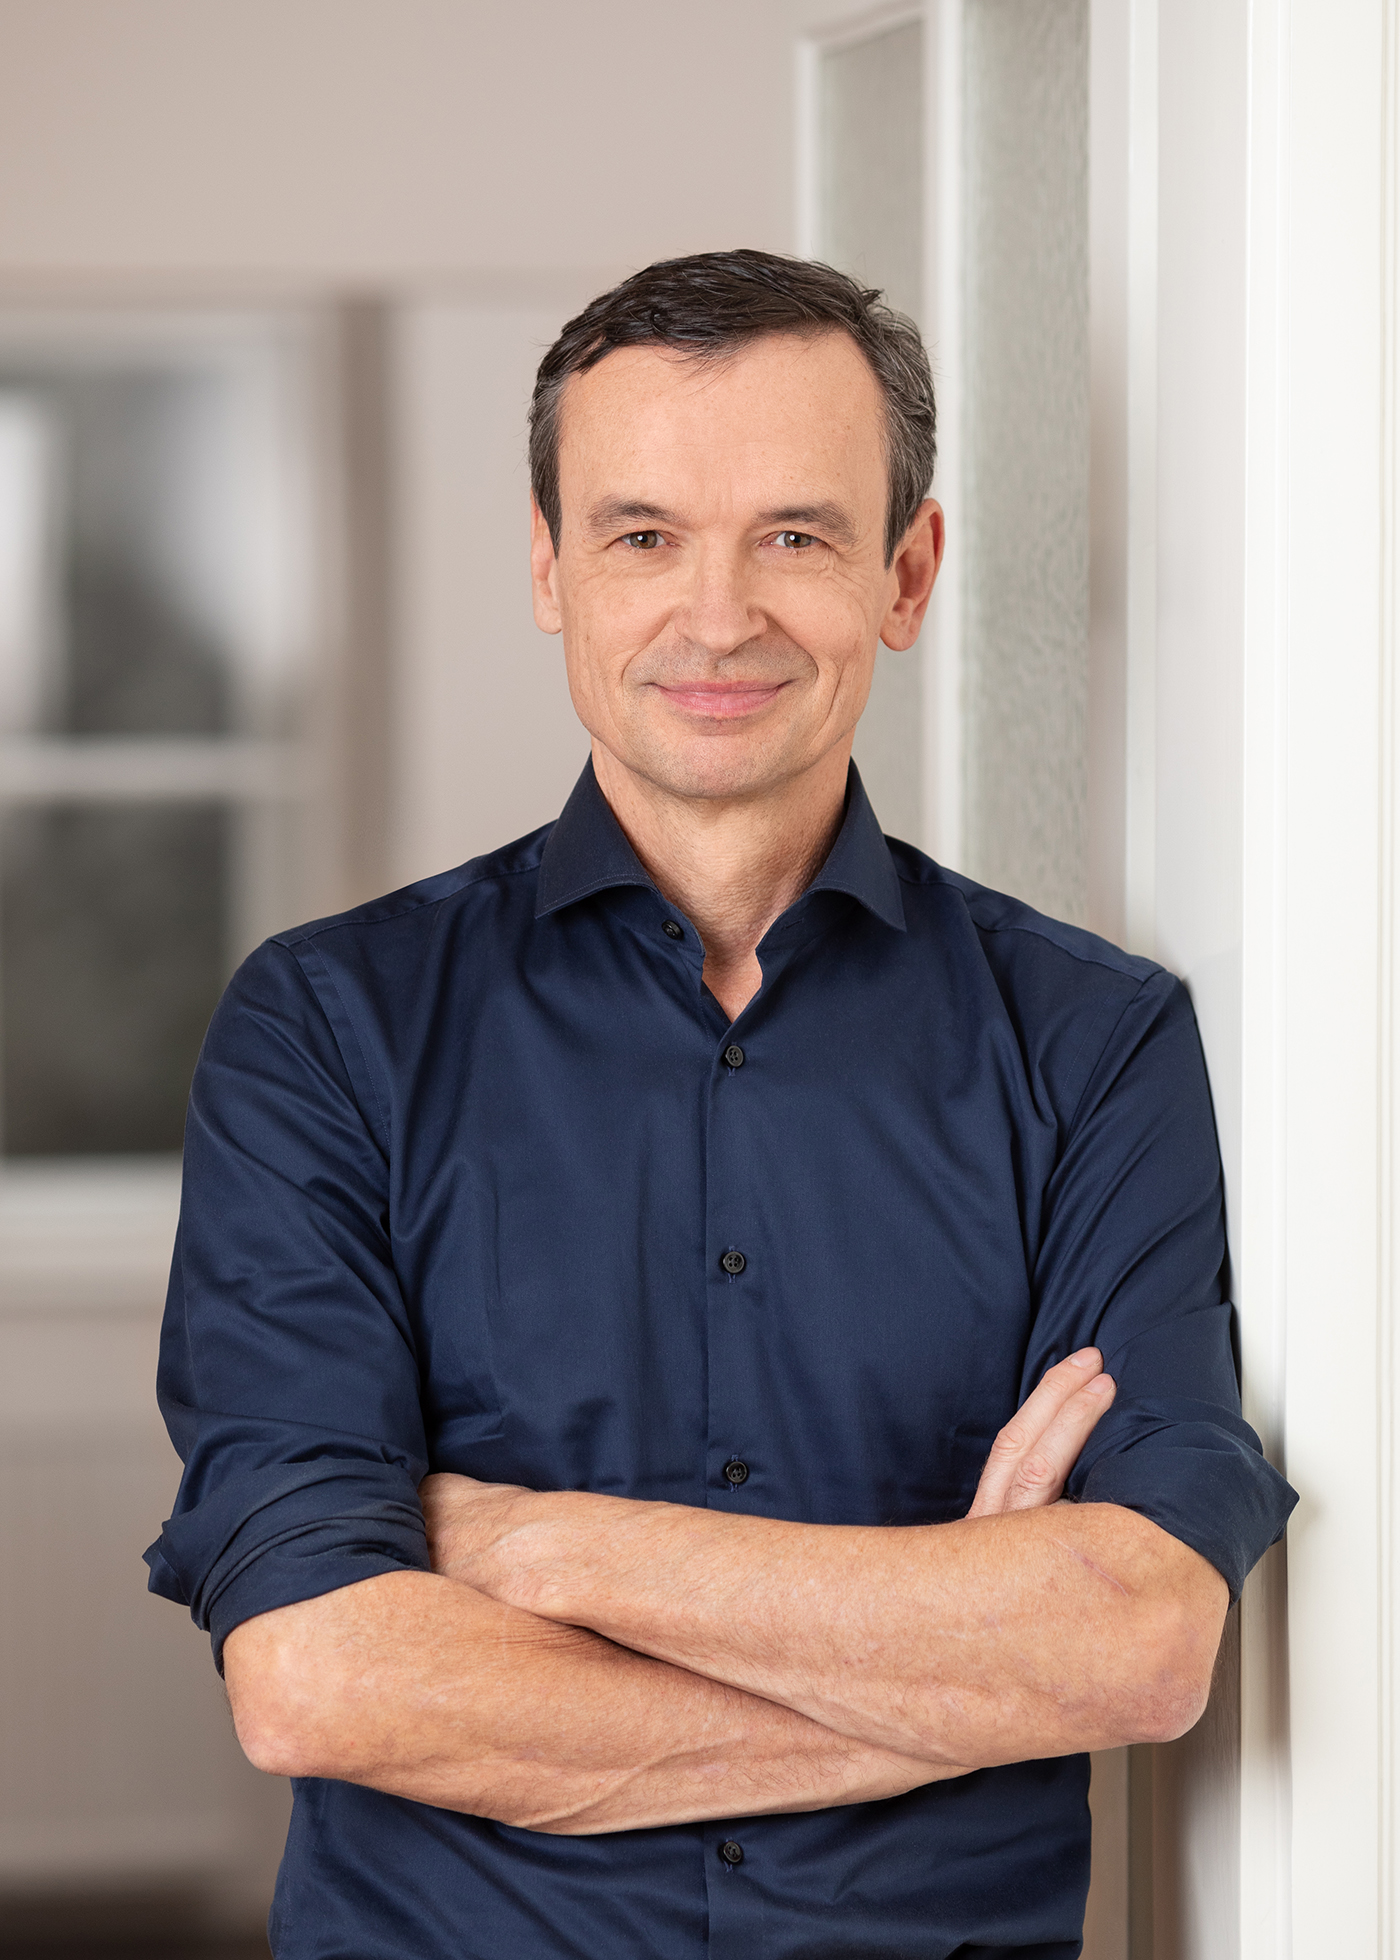 Martin Gössler